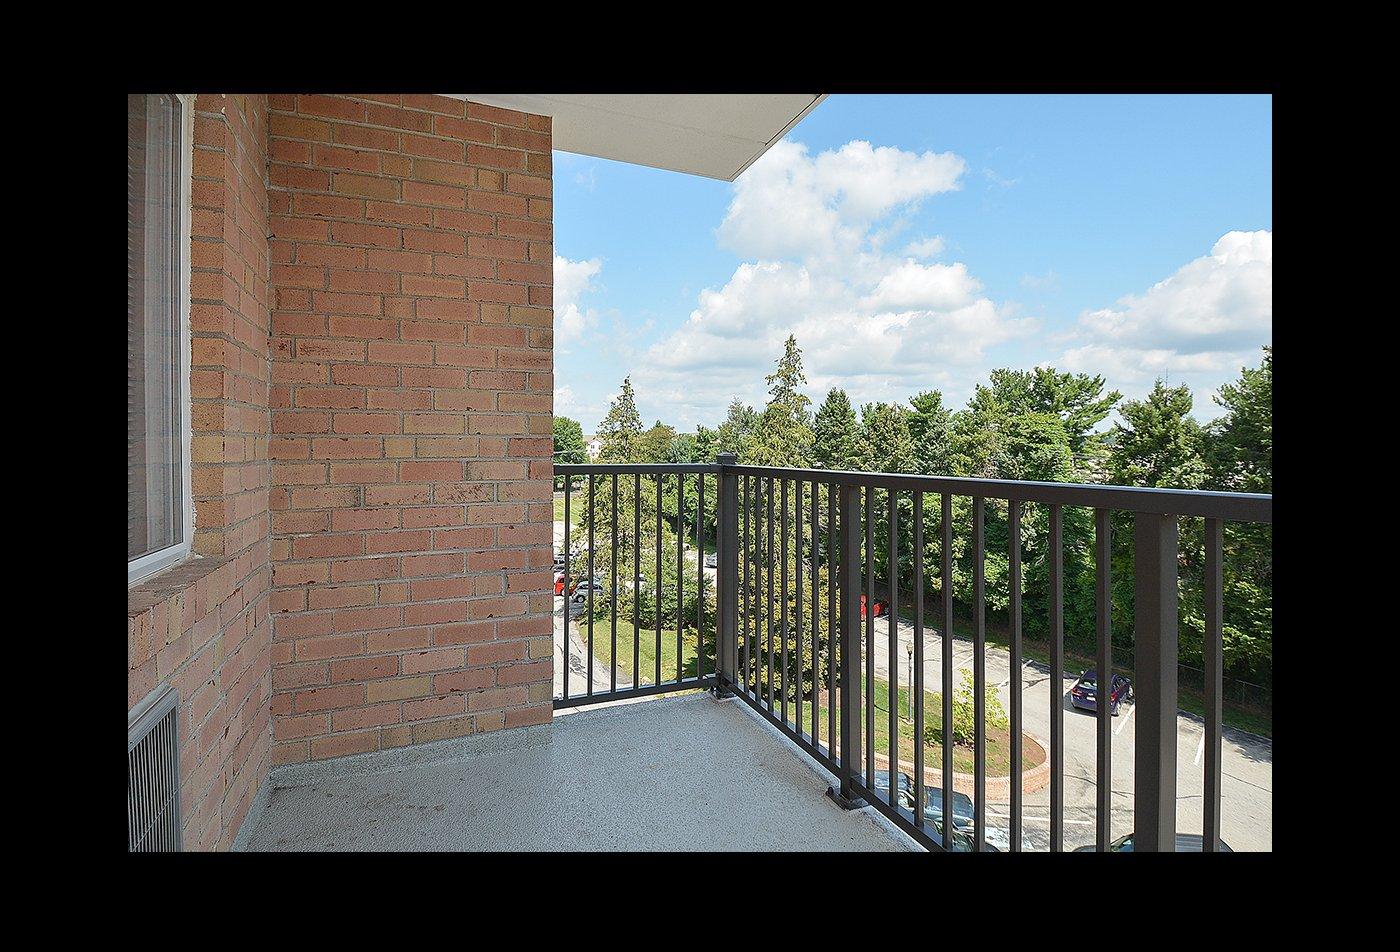 Spacious Apartment Balcony | East Norriton PA Apartments For Rent | Norriton East Apartments